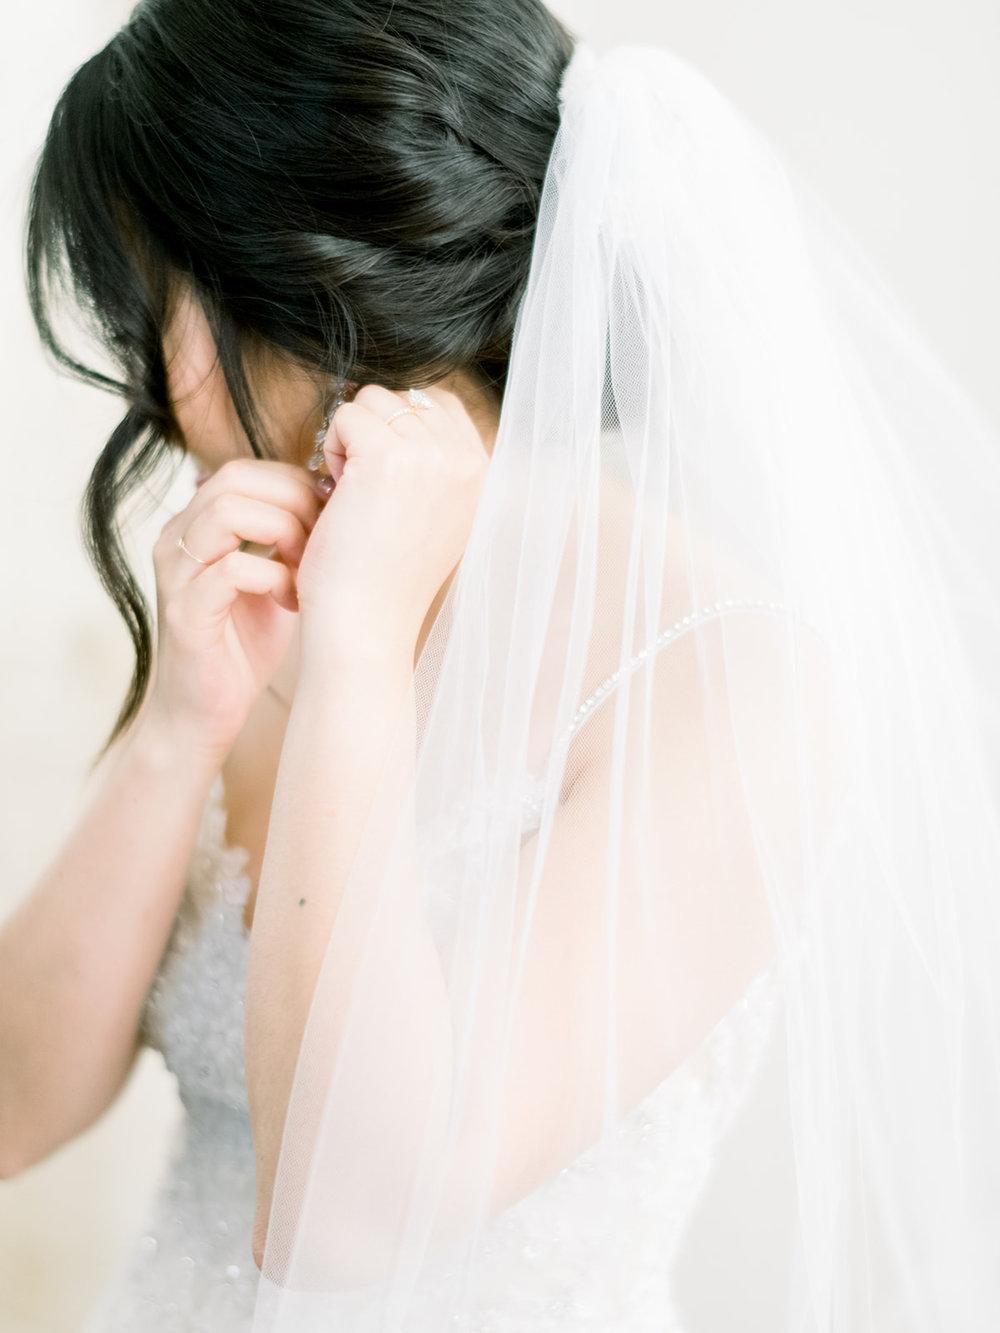 jueunandjon-etherandsmith-wedding-637.jpg